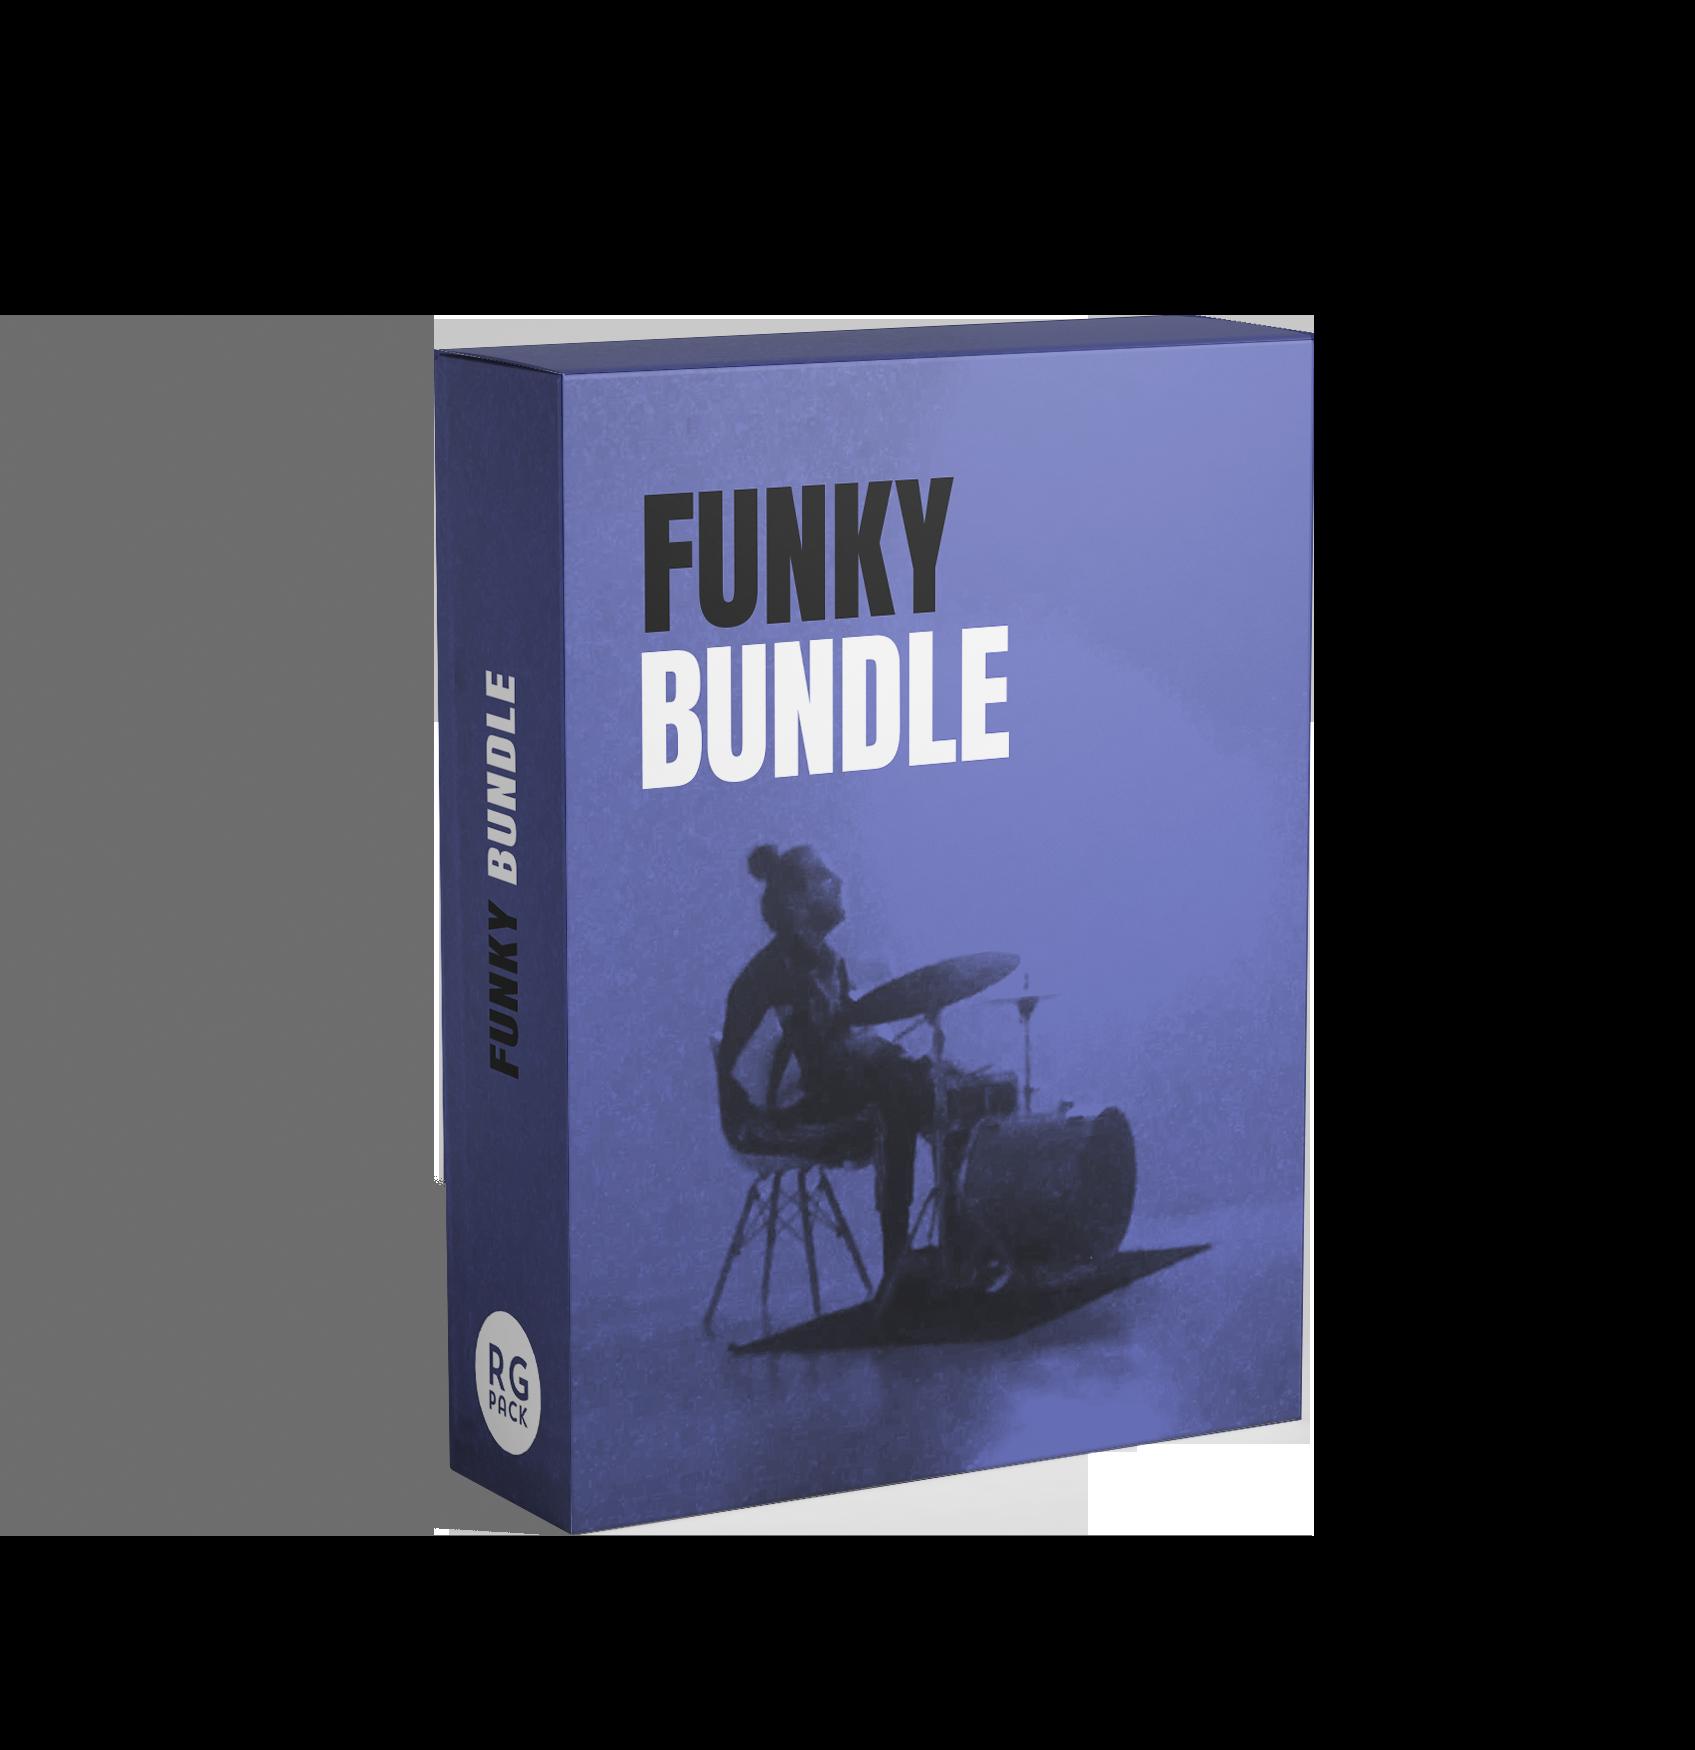 Funky Bundle